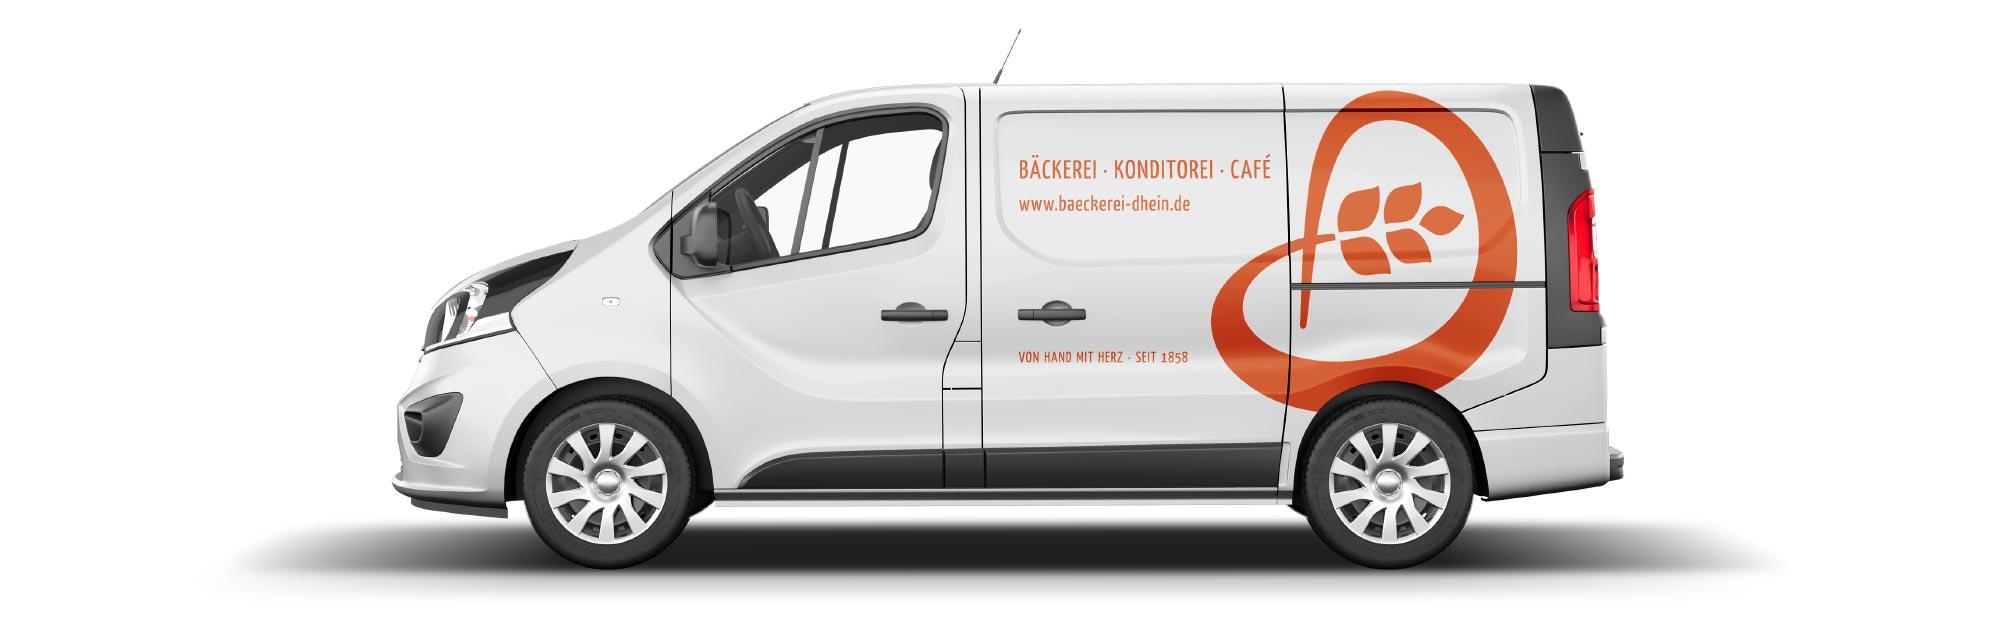 Branding - Fahrzeugbeschriftung Bäckerei Dhein by Designfieber